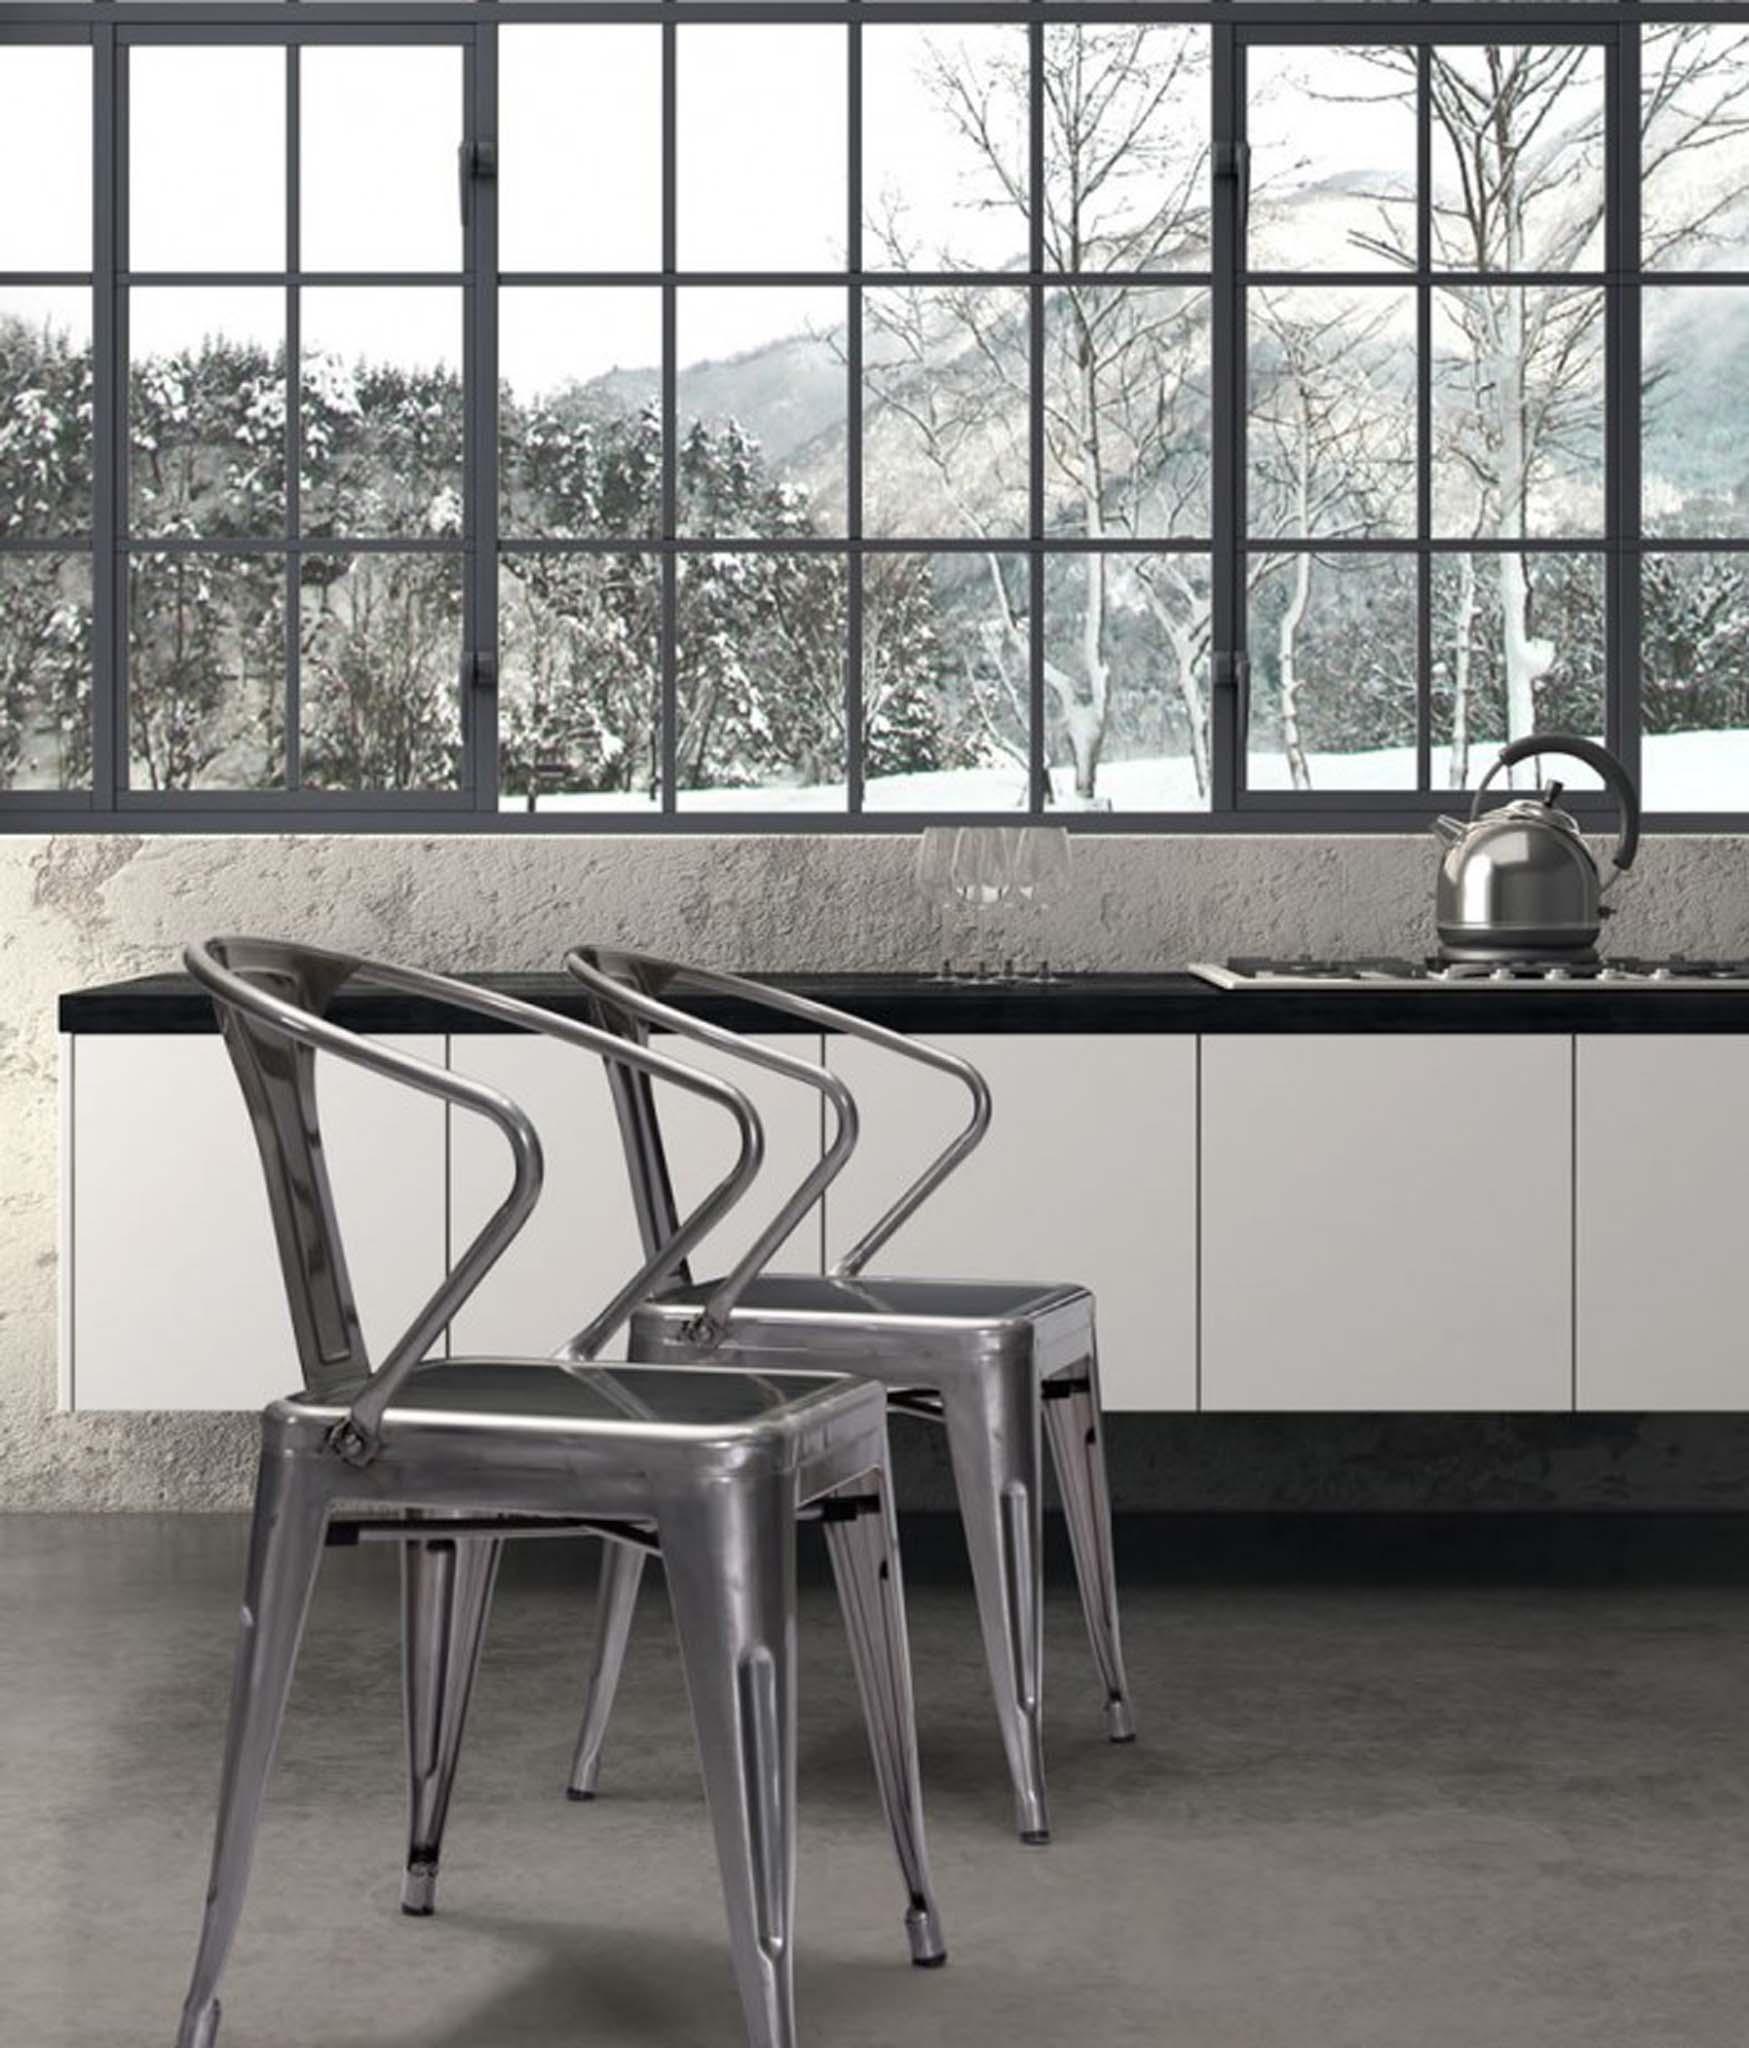 helix gunmetal dining chair